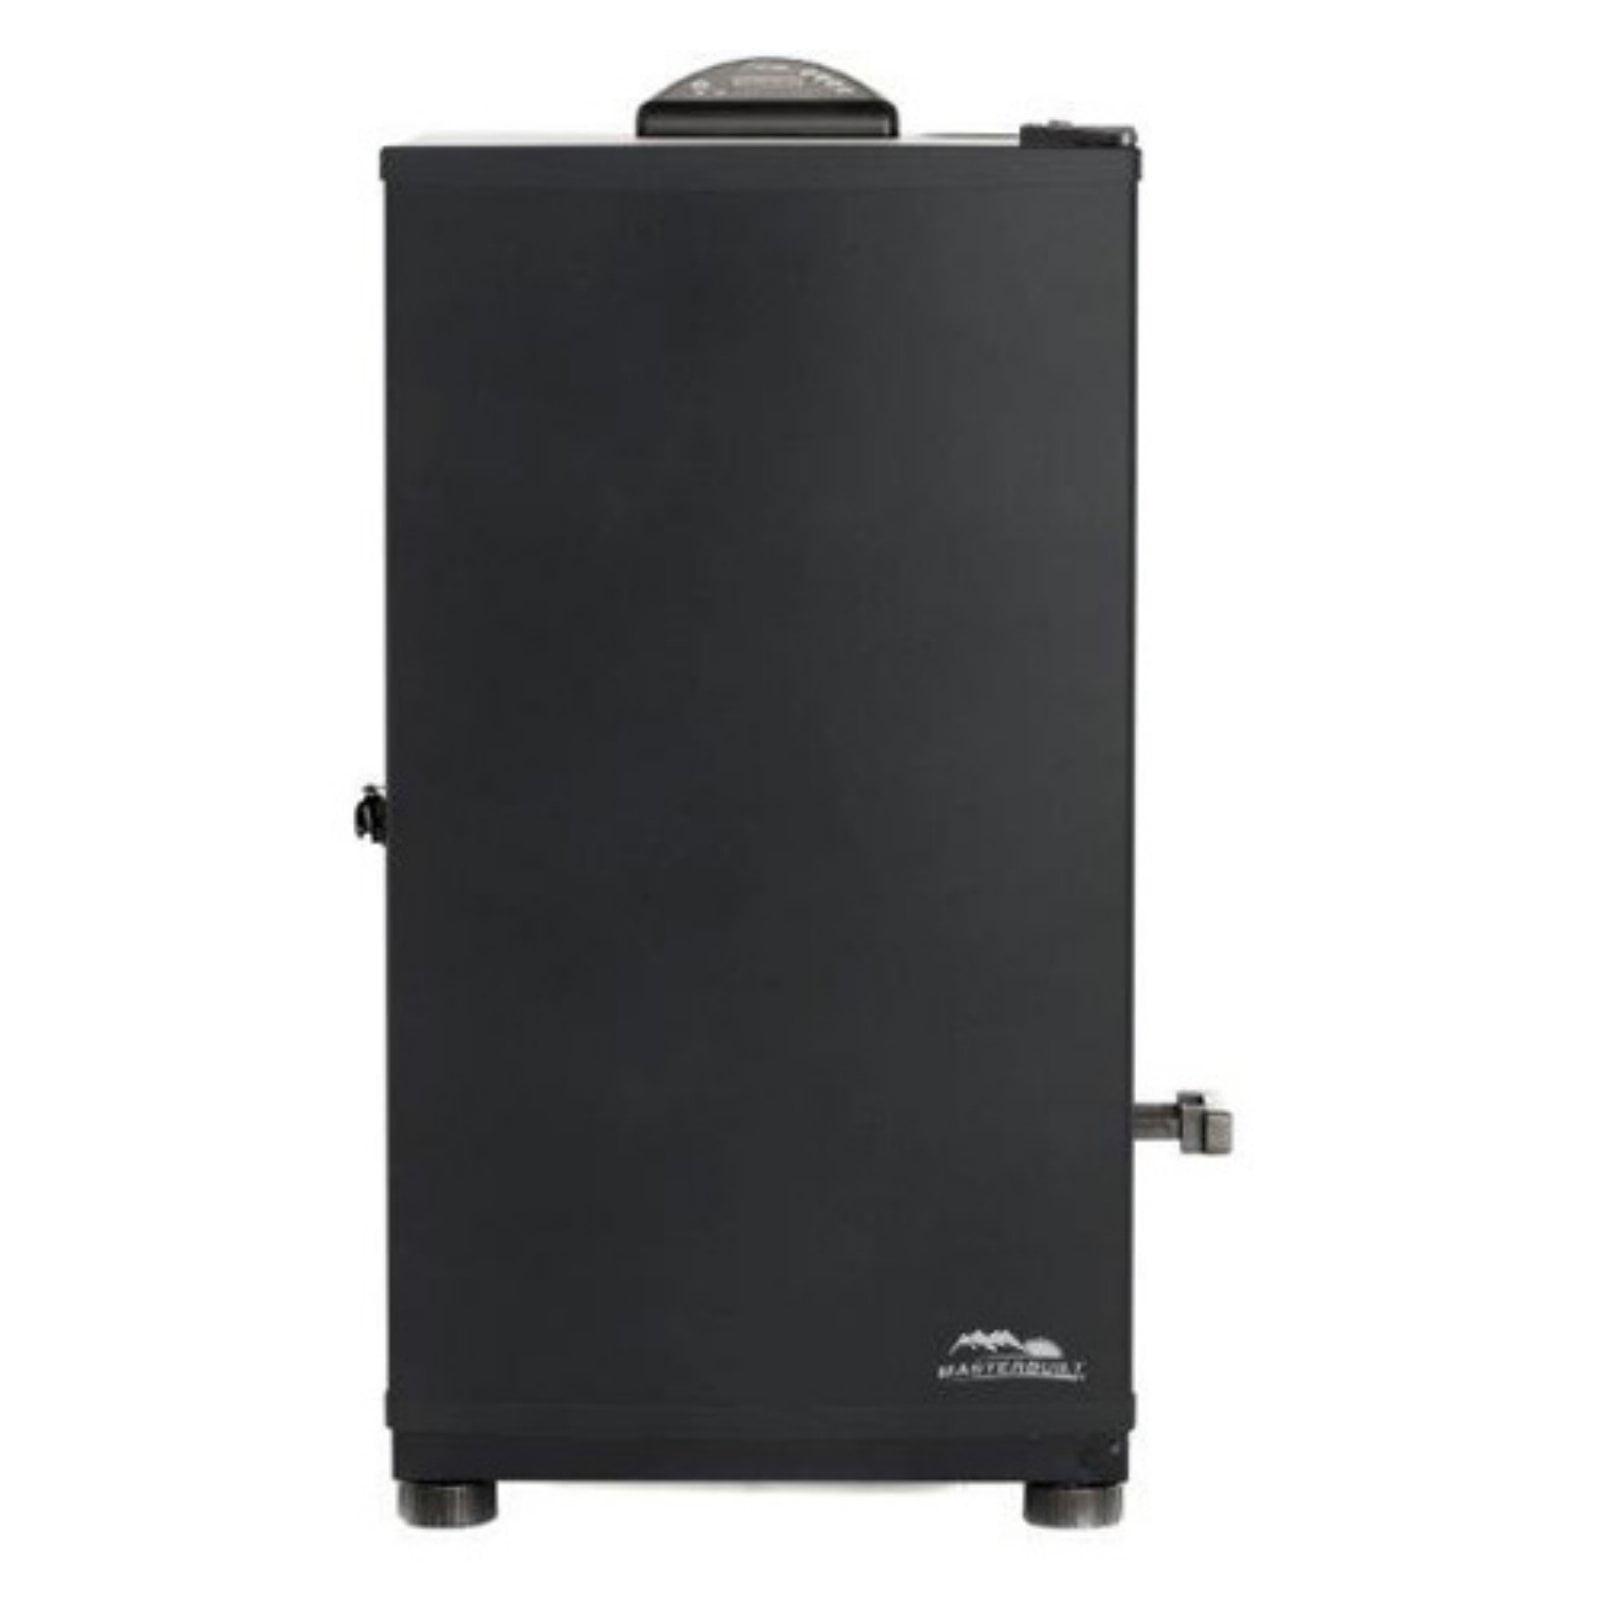 "Masterbuilt 30"" Electronic Electric Smoker by Masterbuilt Manufacturing Inc"